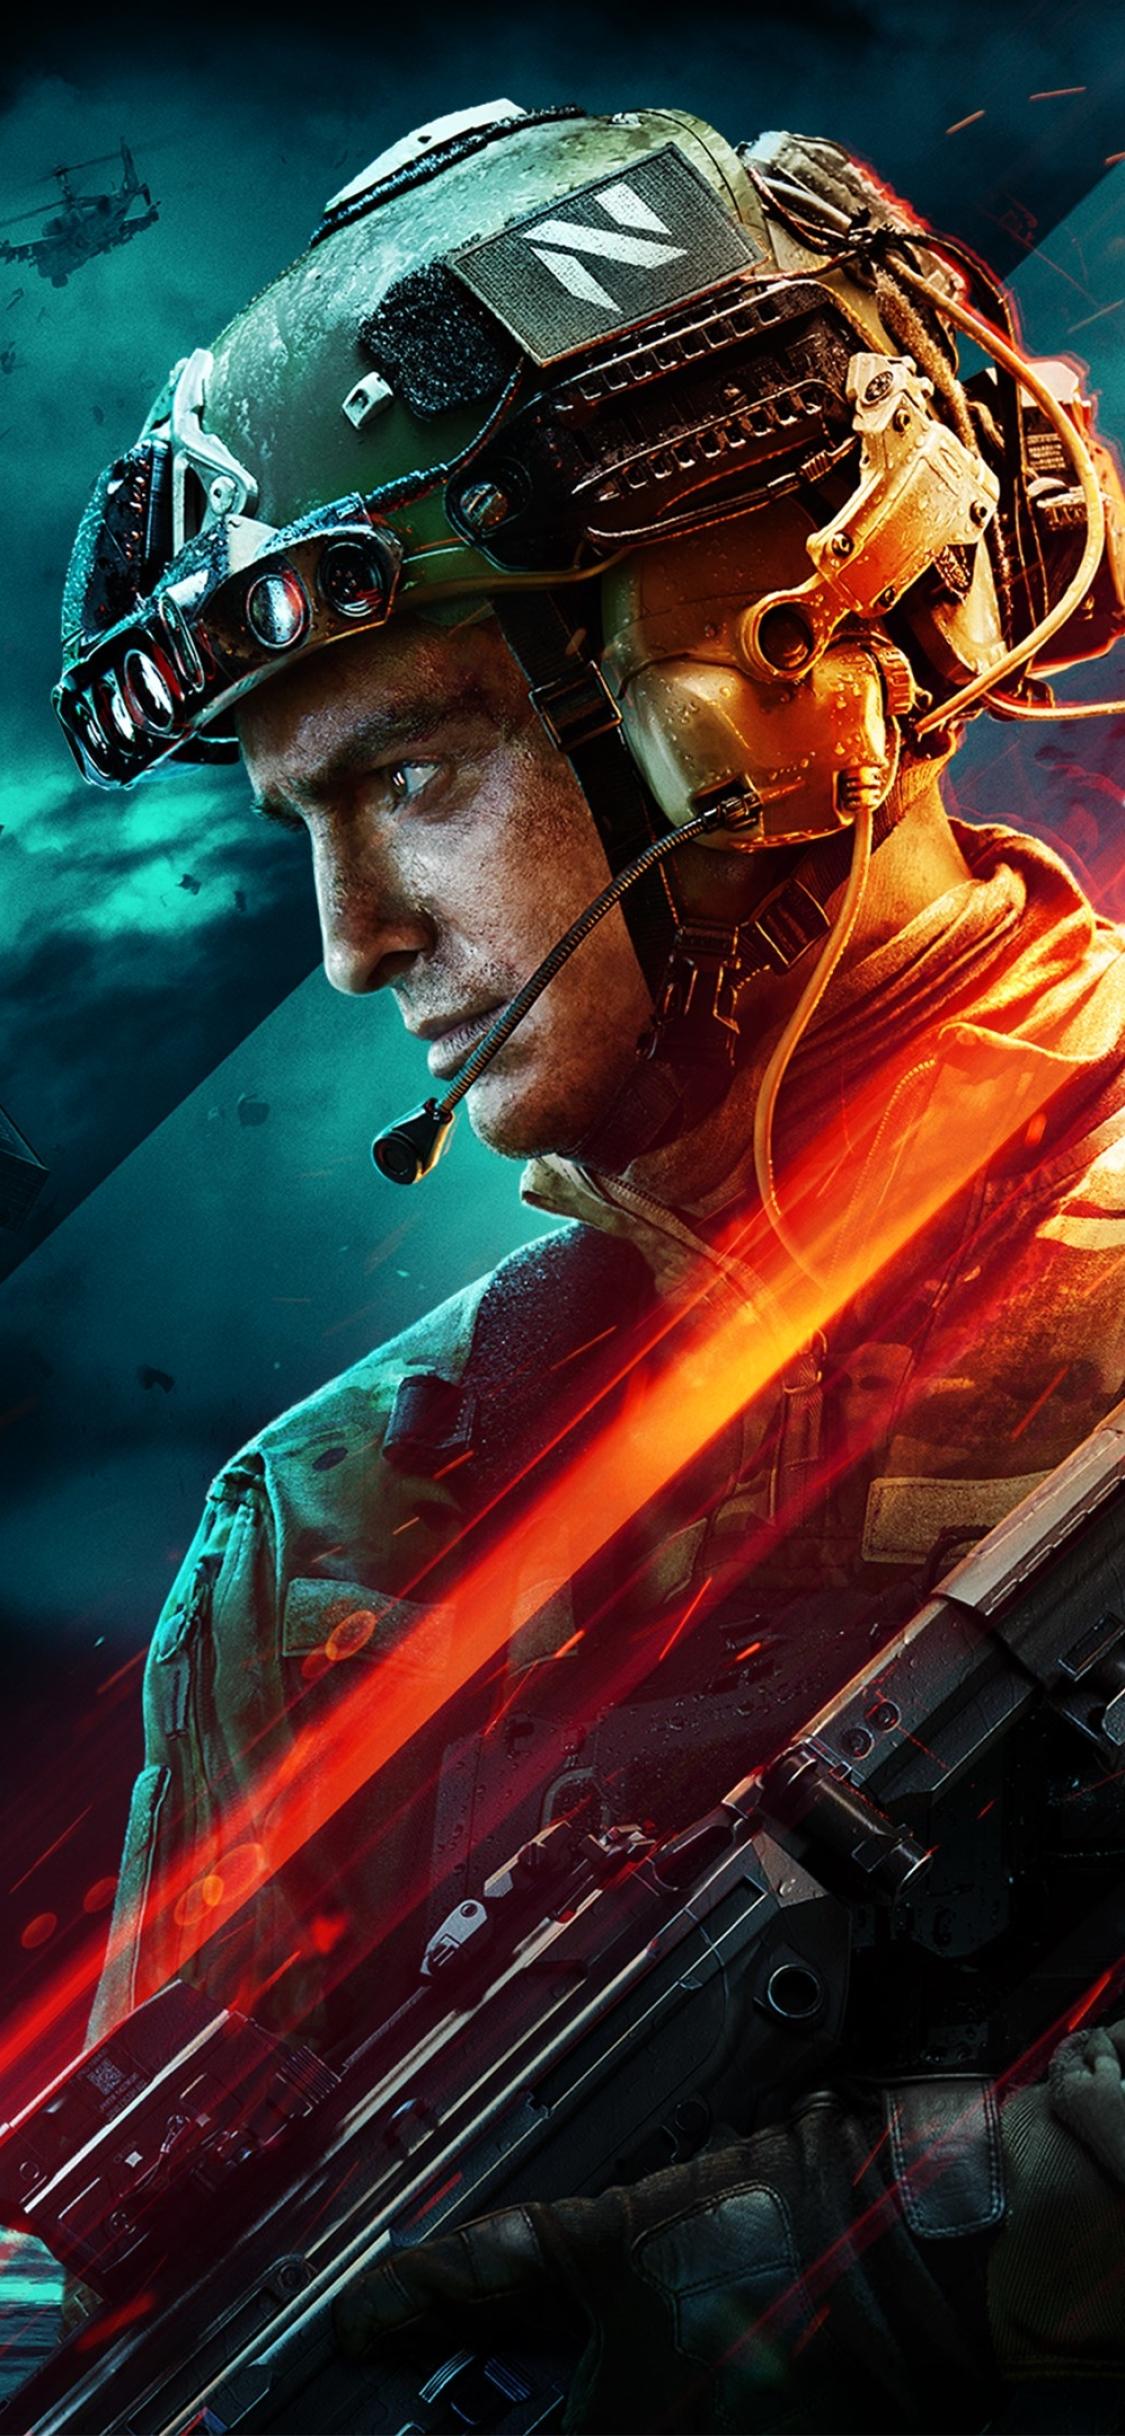 Battlefield 2042 Mobile wallpaper